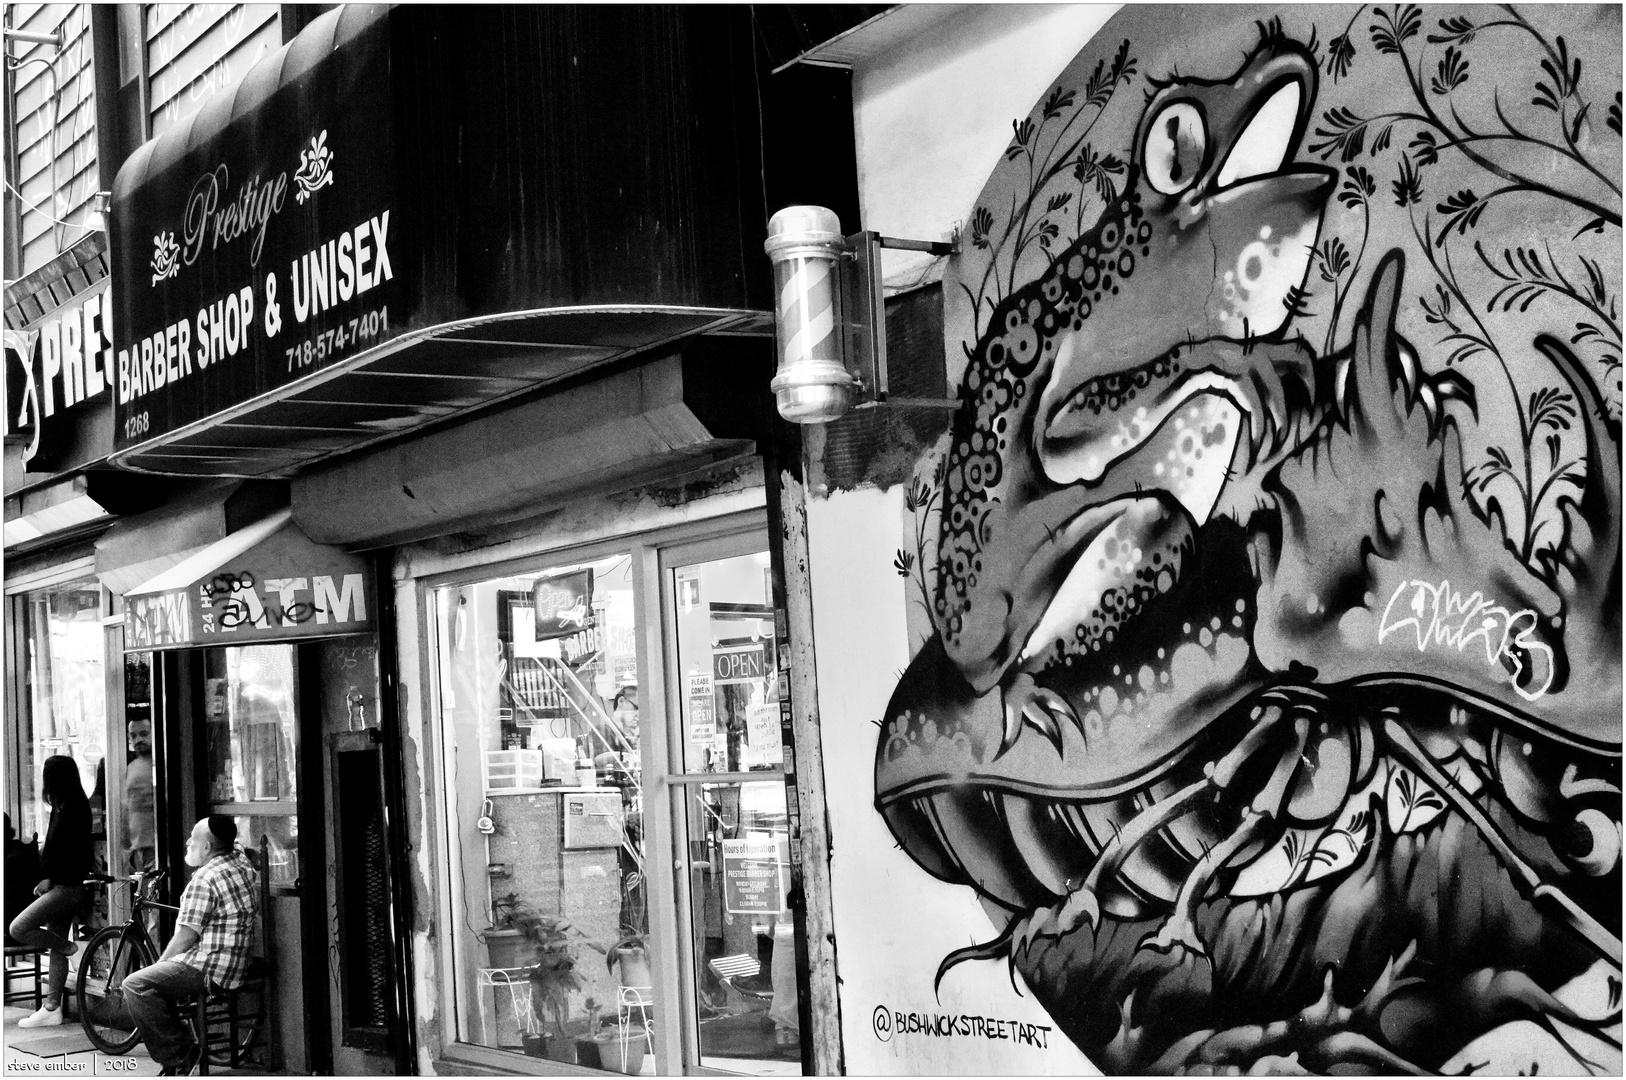 Barbershop and Bullfrog - A Bushwick Moment